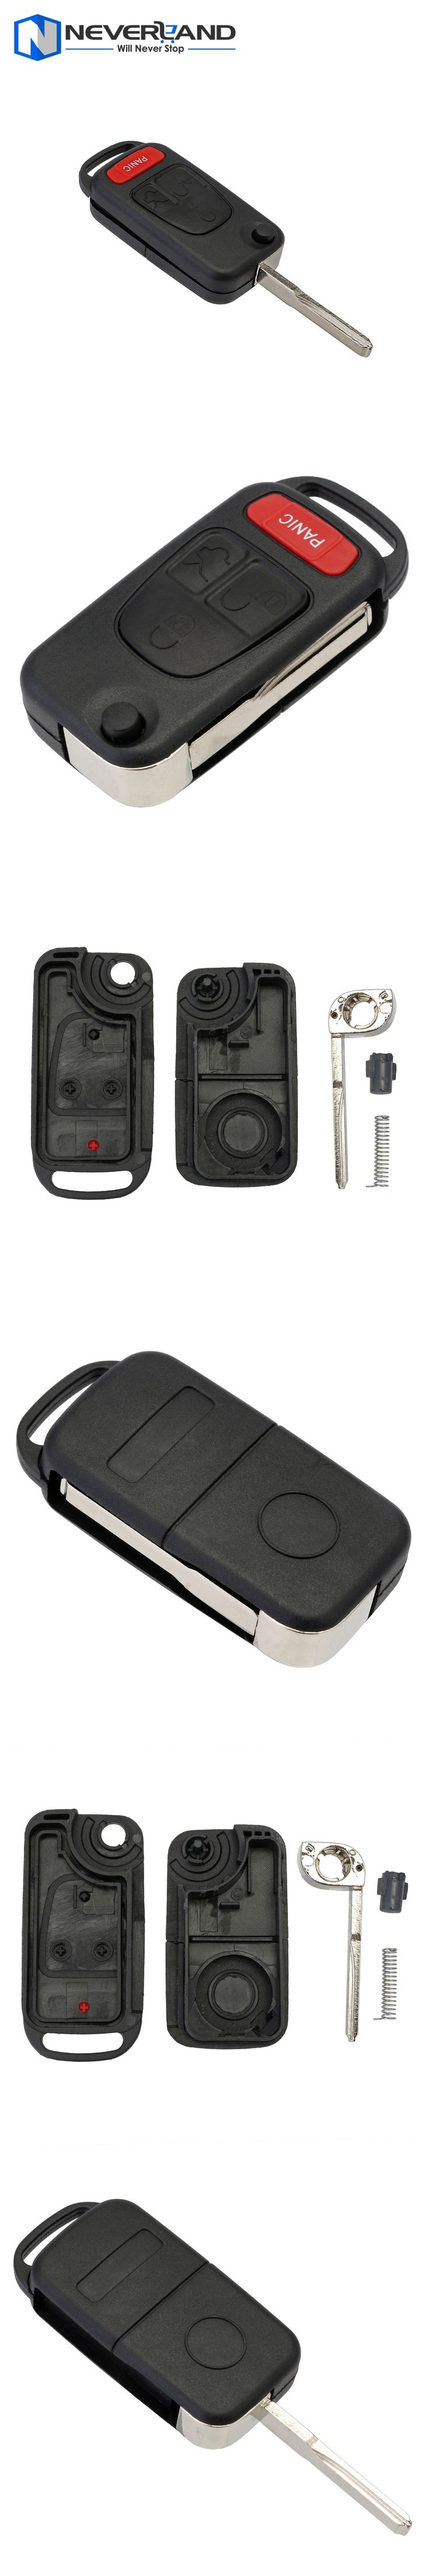 3 +1 Button 4 Button Panic Uncut Blade Flip Remote Key Shell Case HU39 Blade For Mercedes Benz ML320 ML55 AMG D05